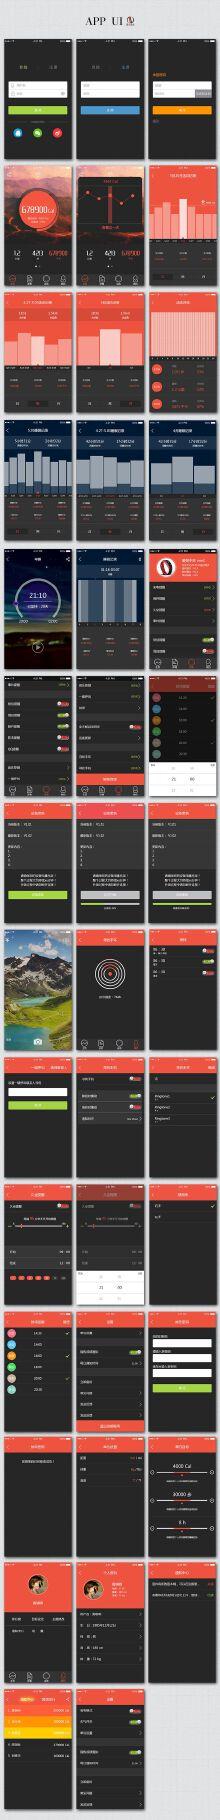 APP界面UI整套设计